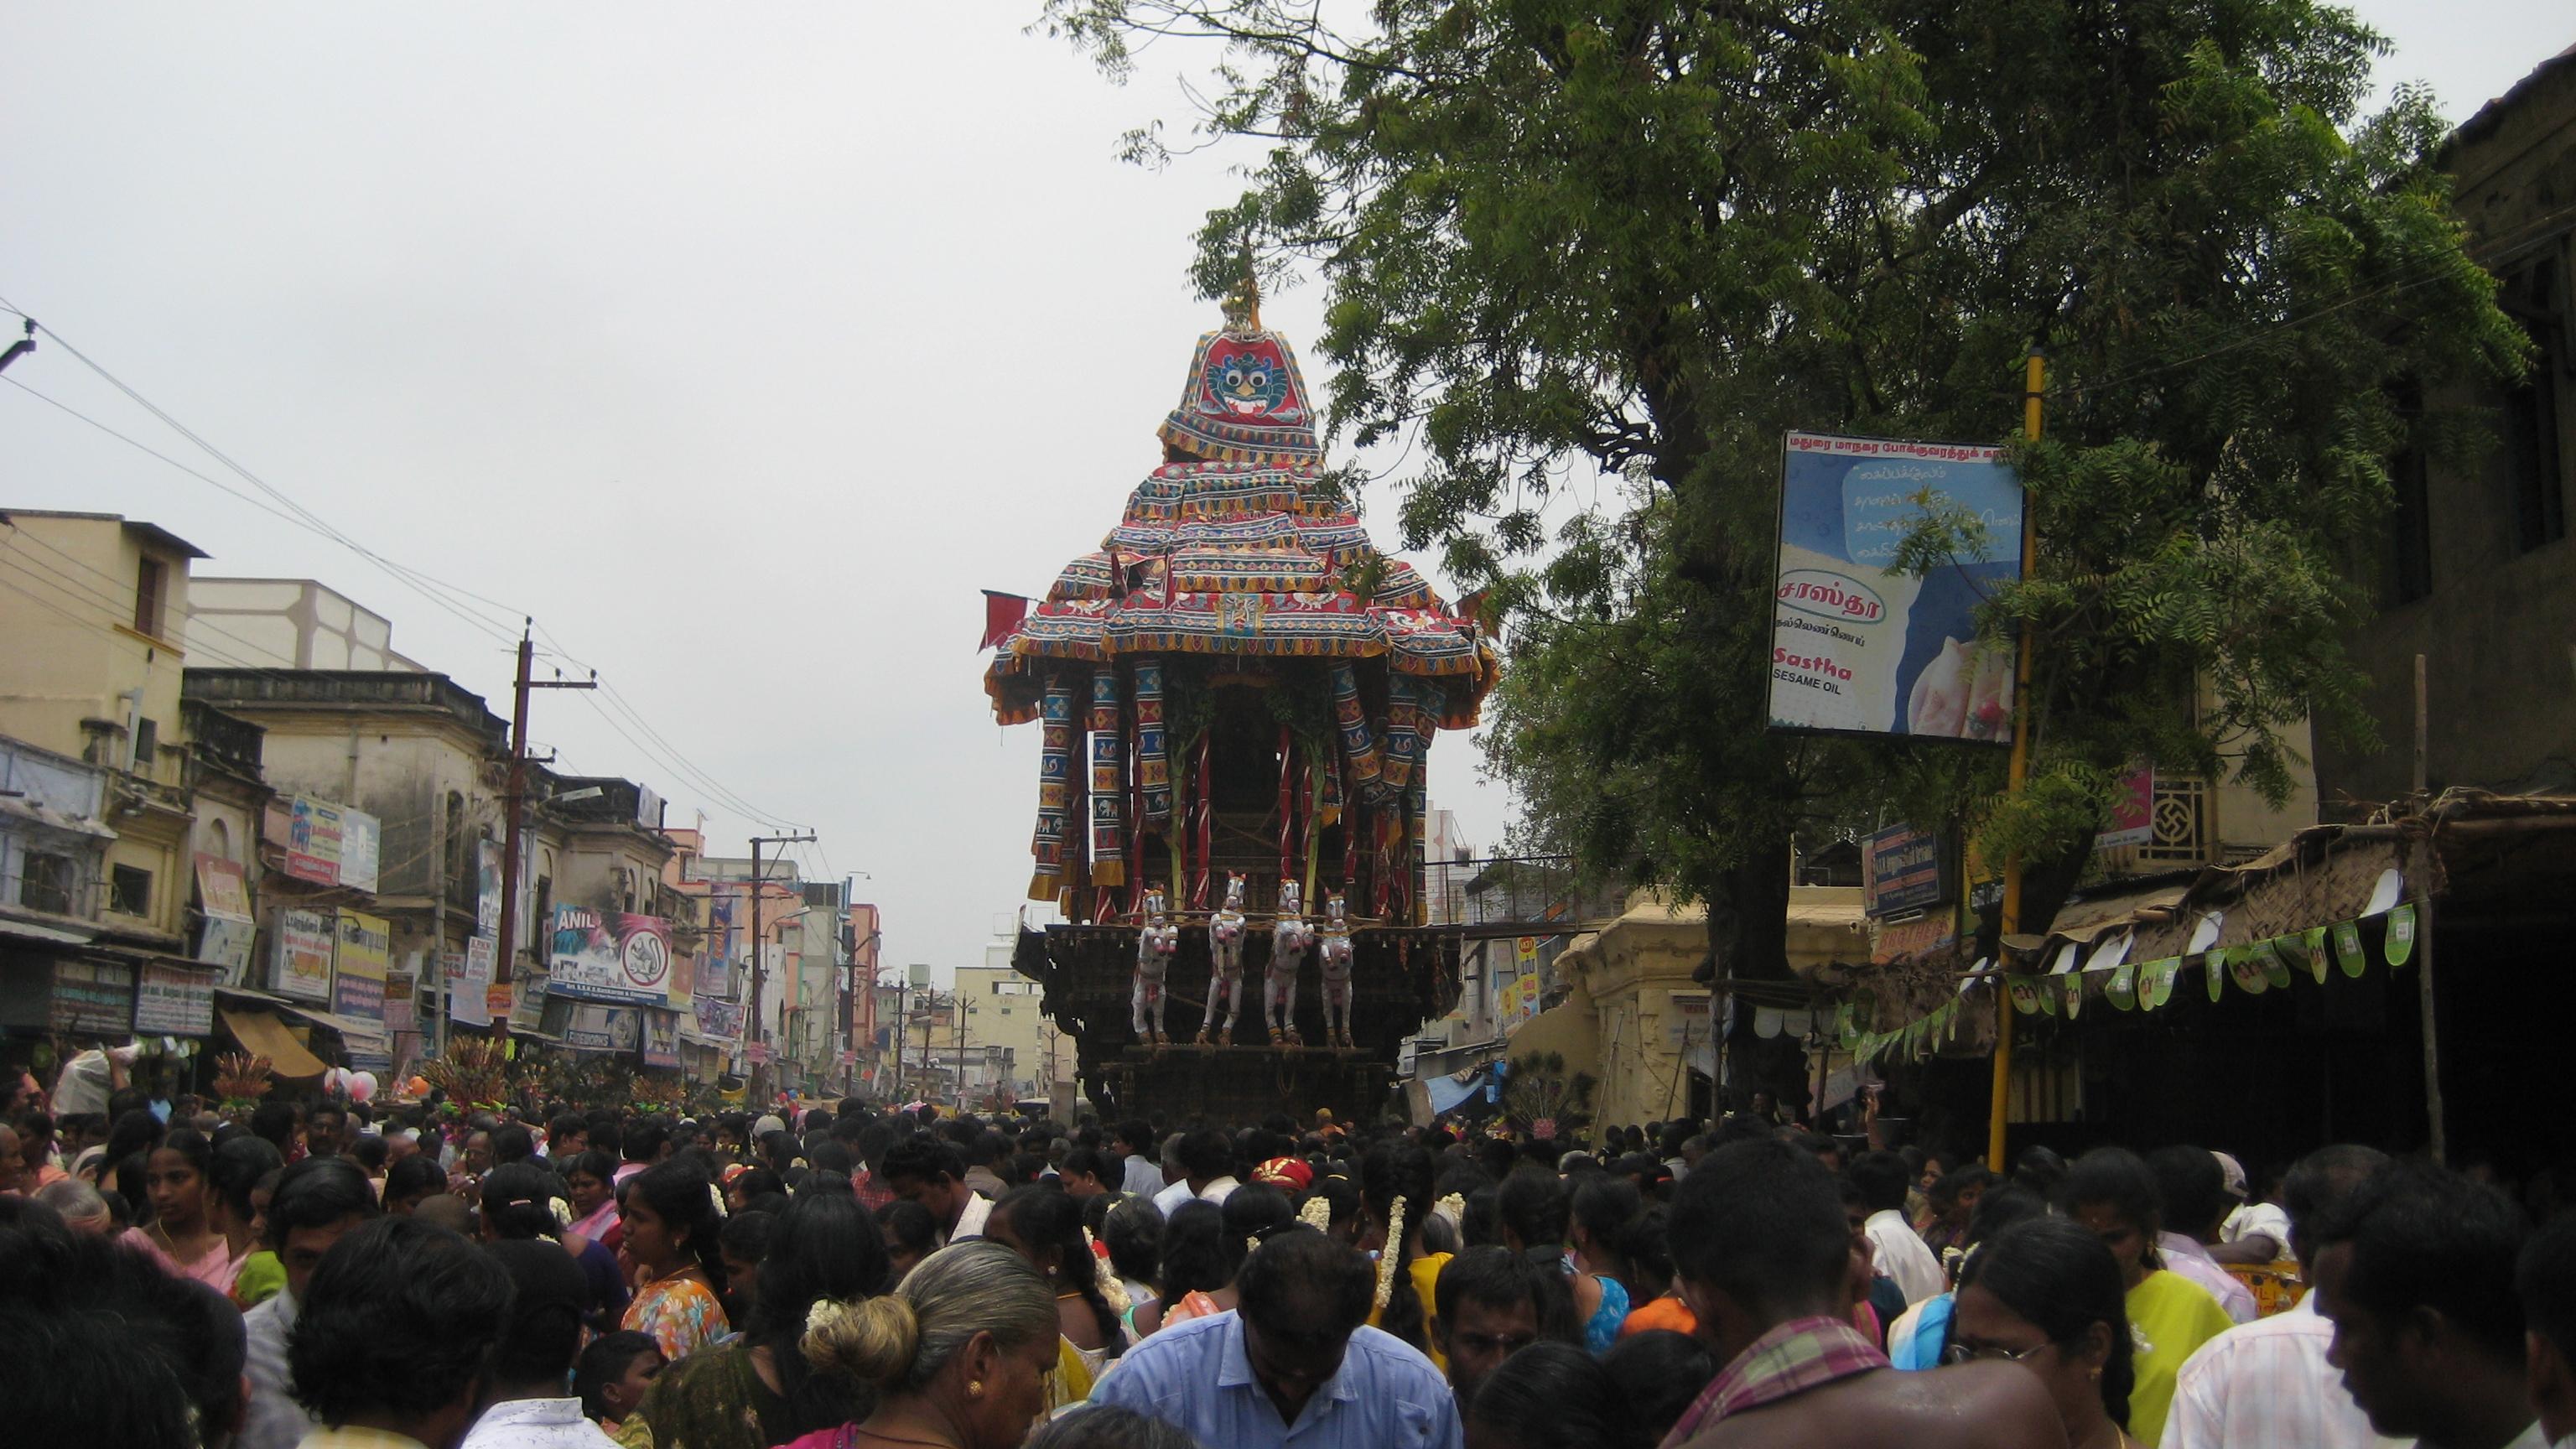 Chithirai festival - Wikipedia